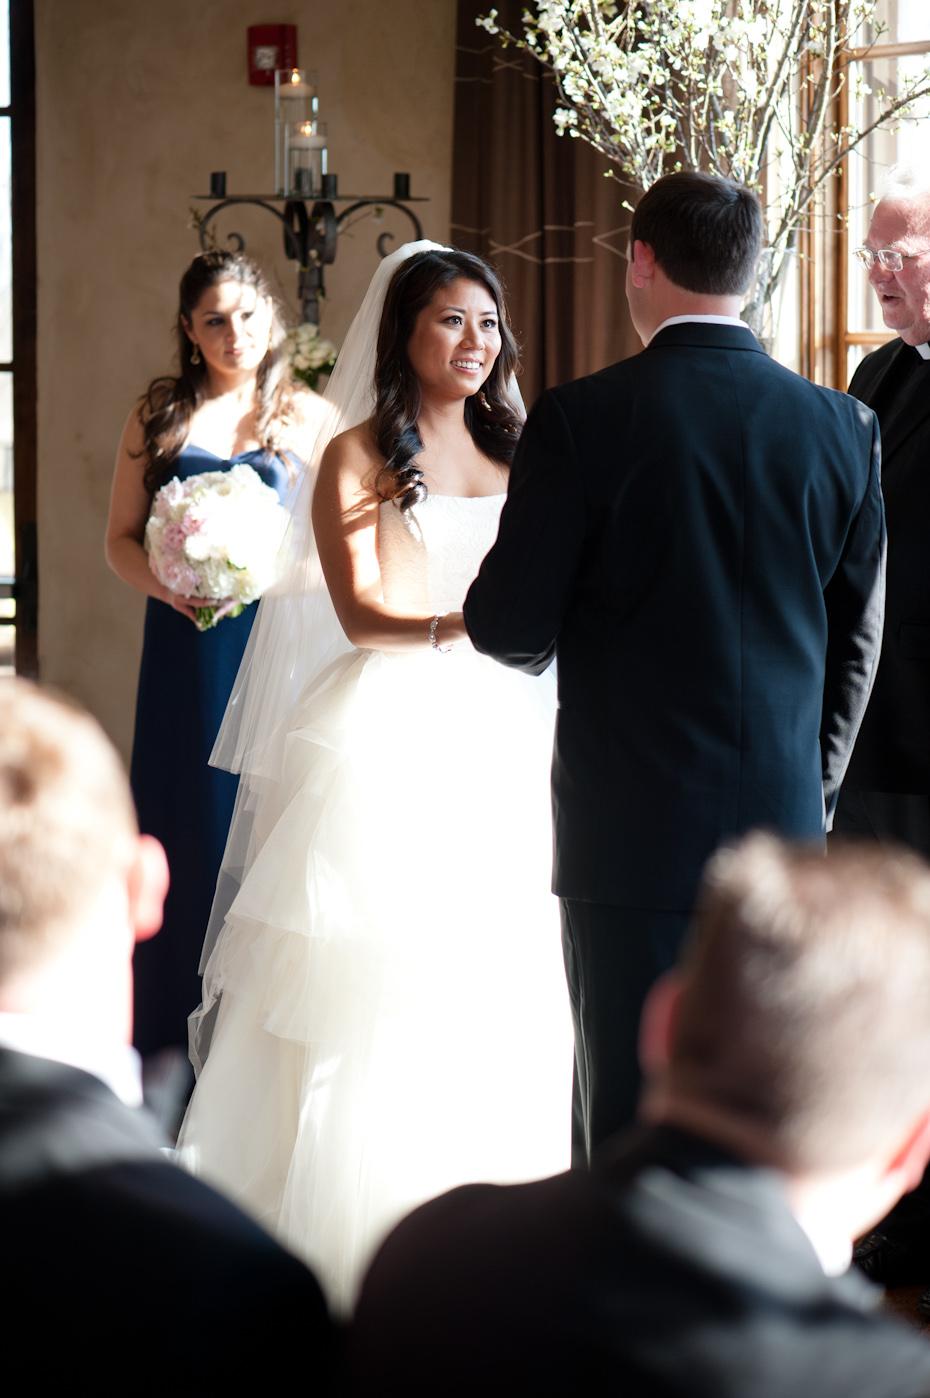 Wedding Ceremony at Montaluce